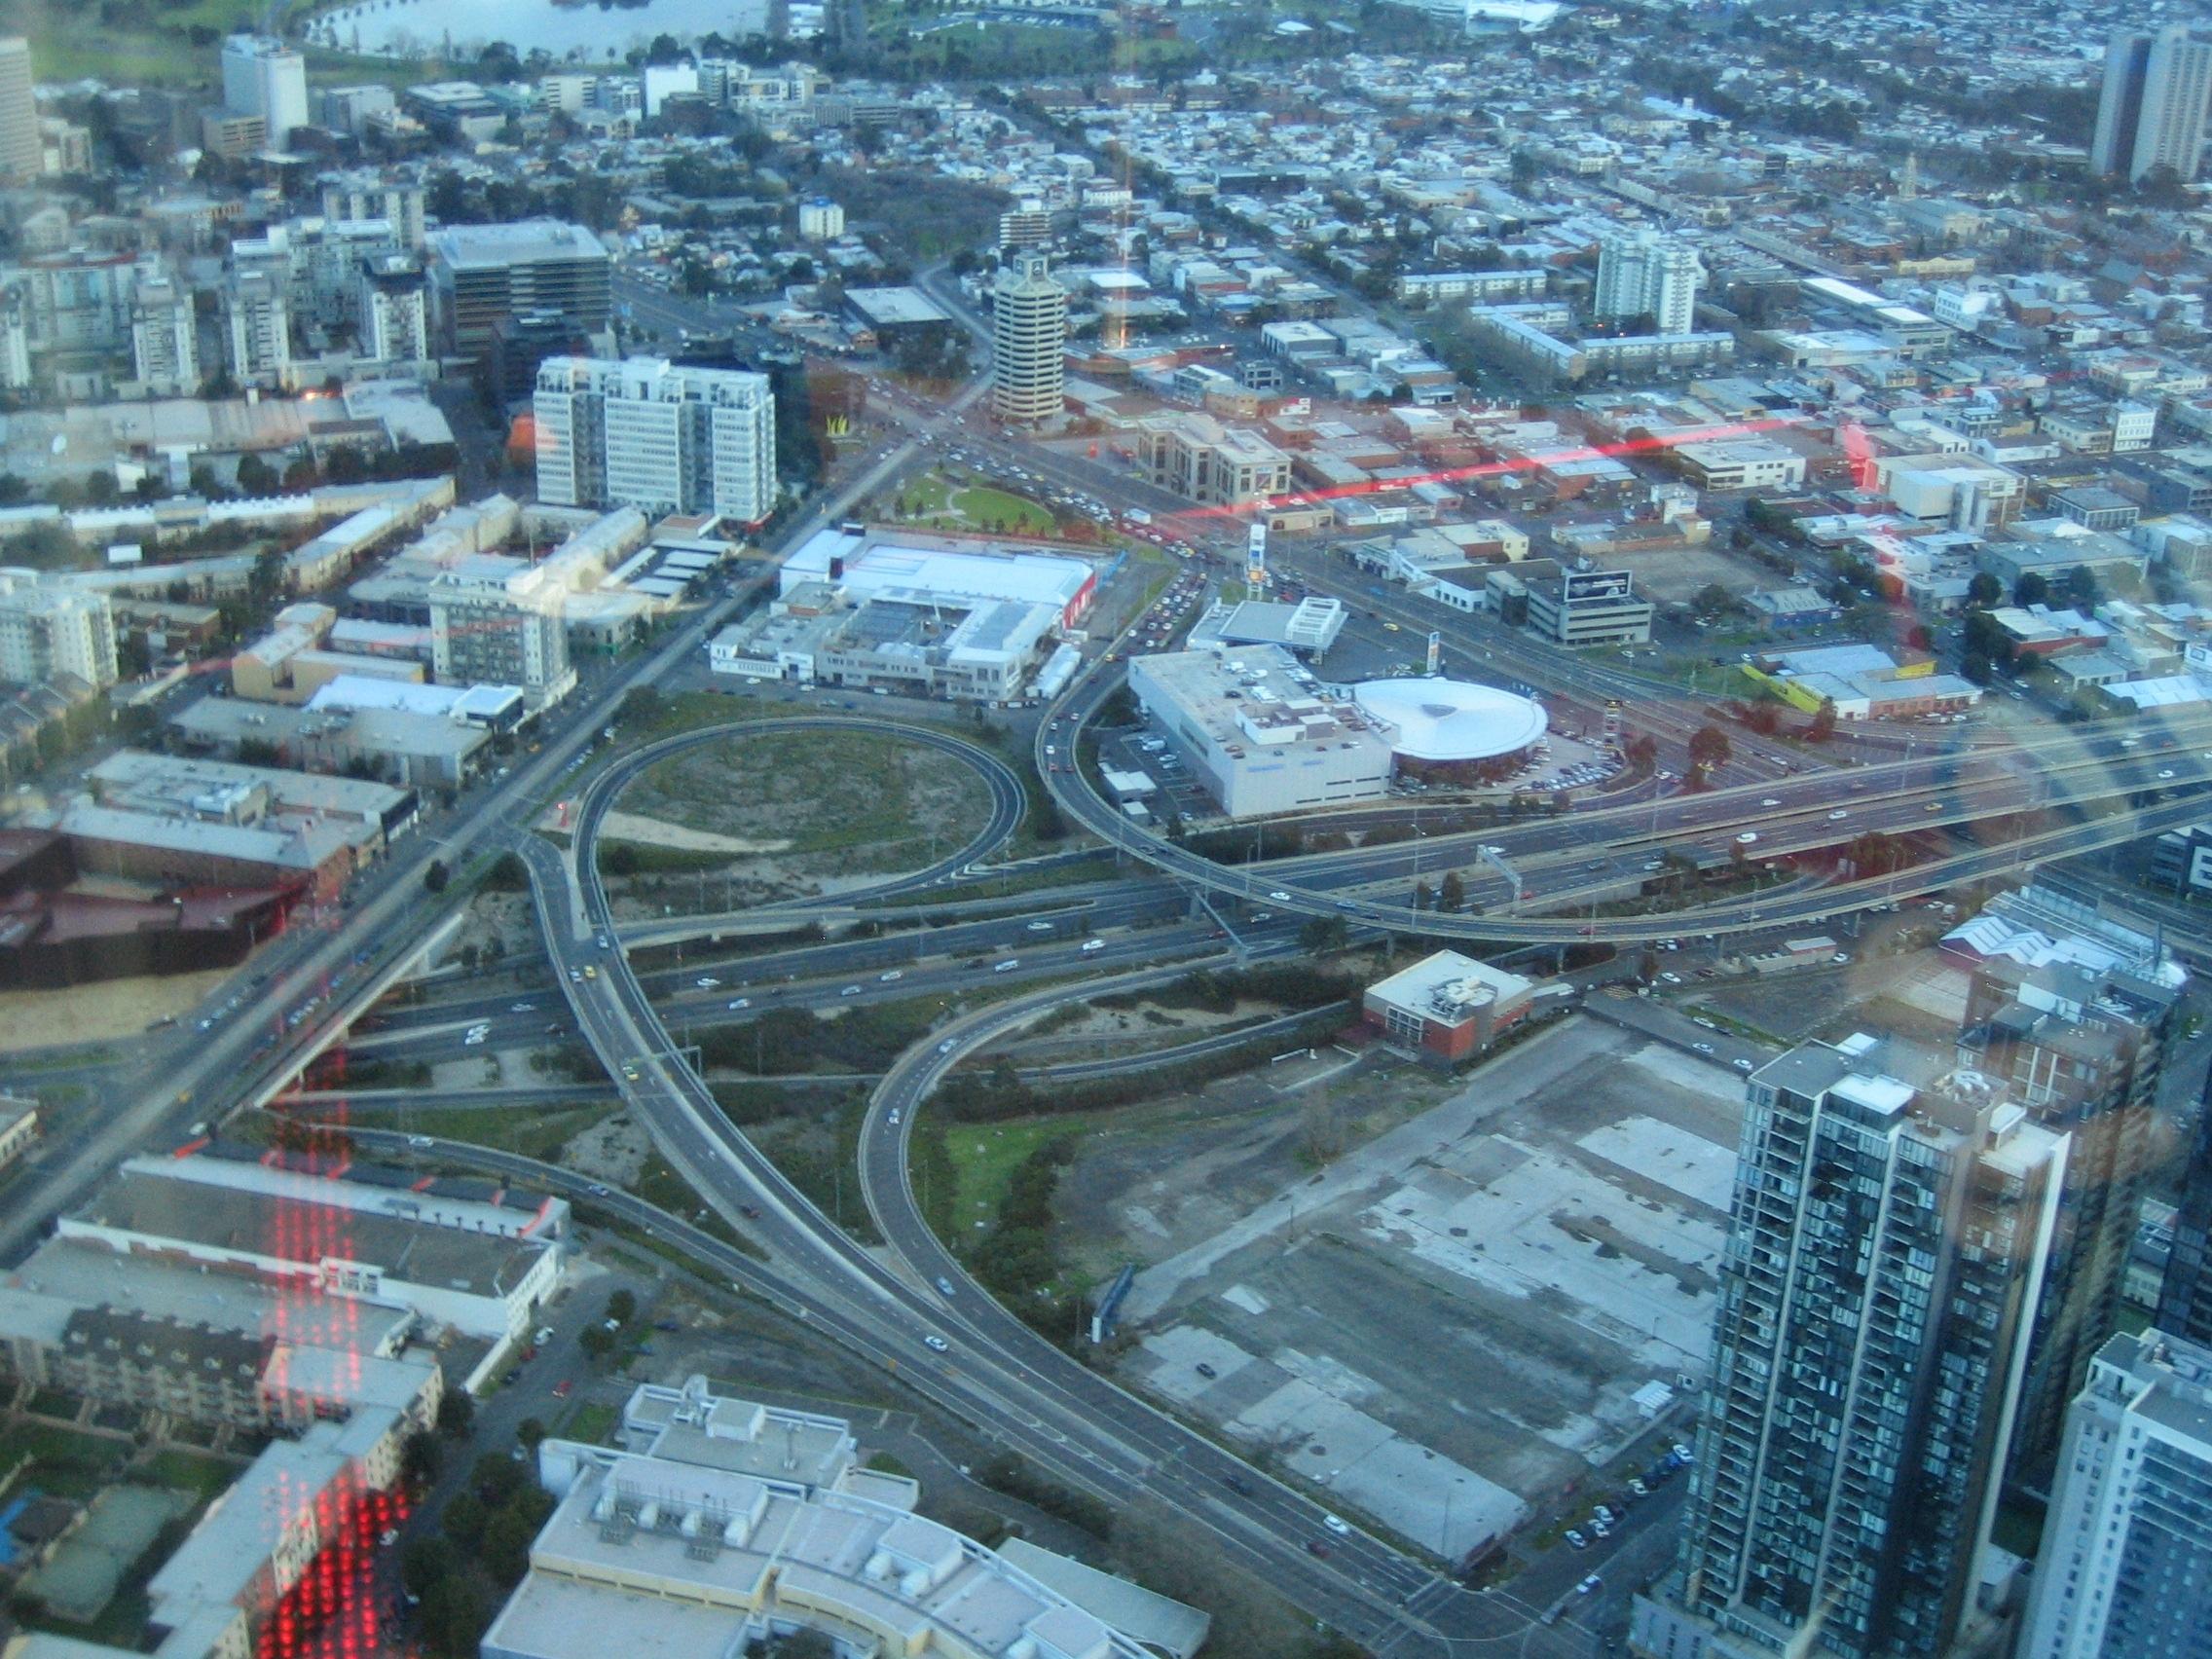 citylink late toll invoice cost invoice template ideas citylink toll invoice